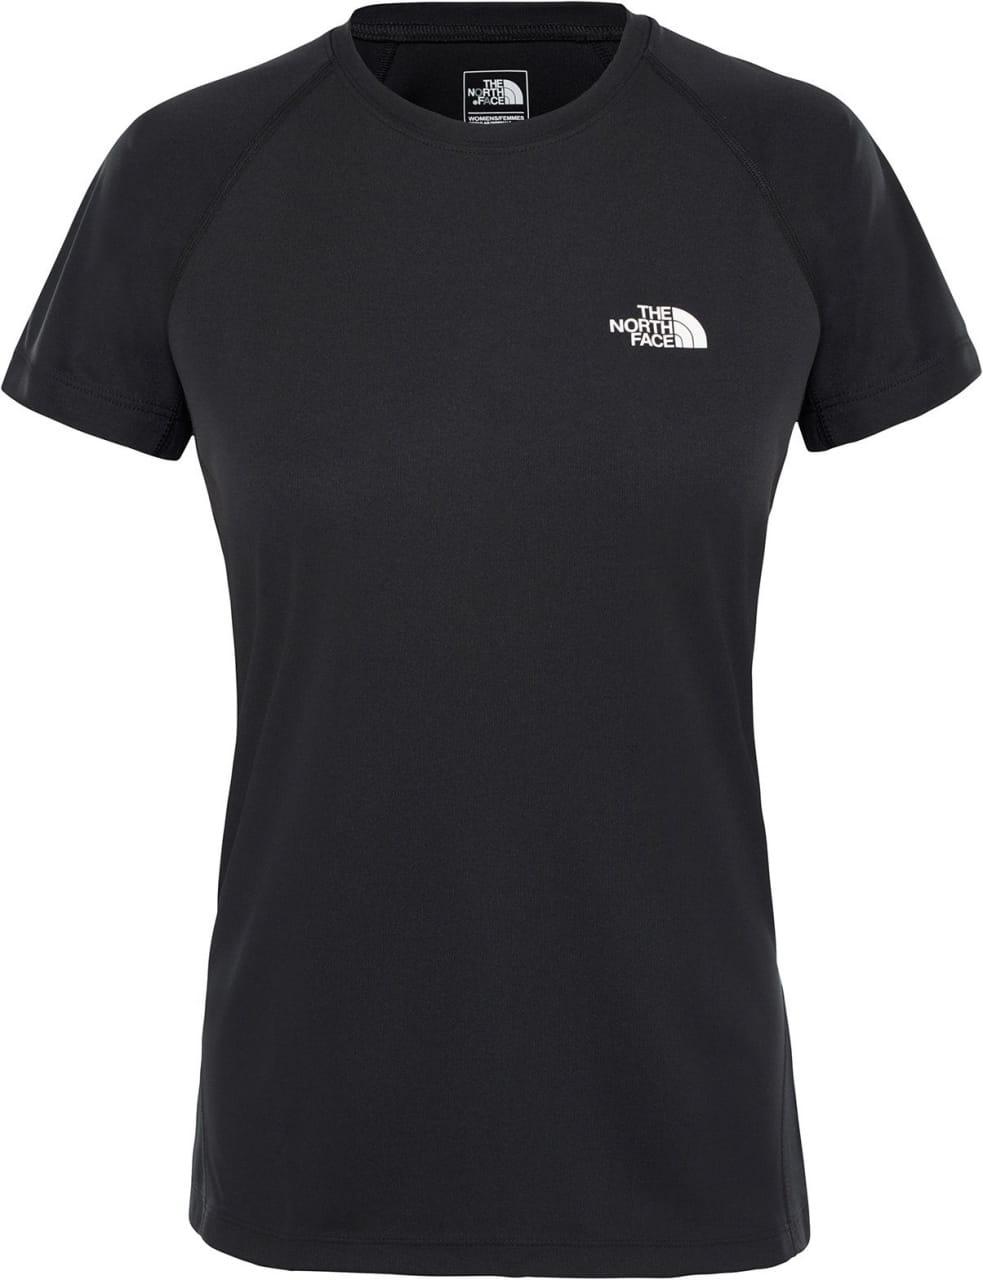 Dámské tričko The North Face Women's Flex T-Shirt